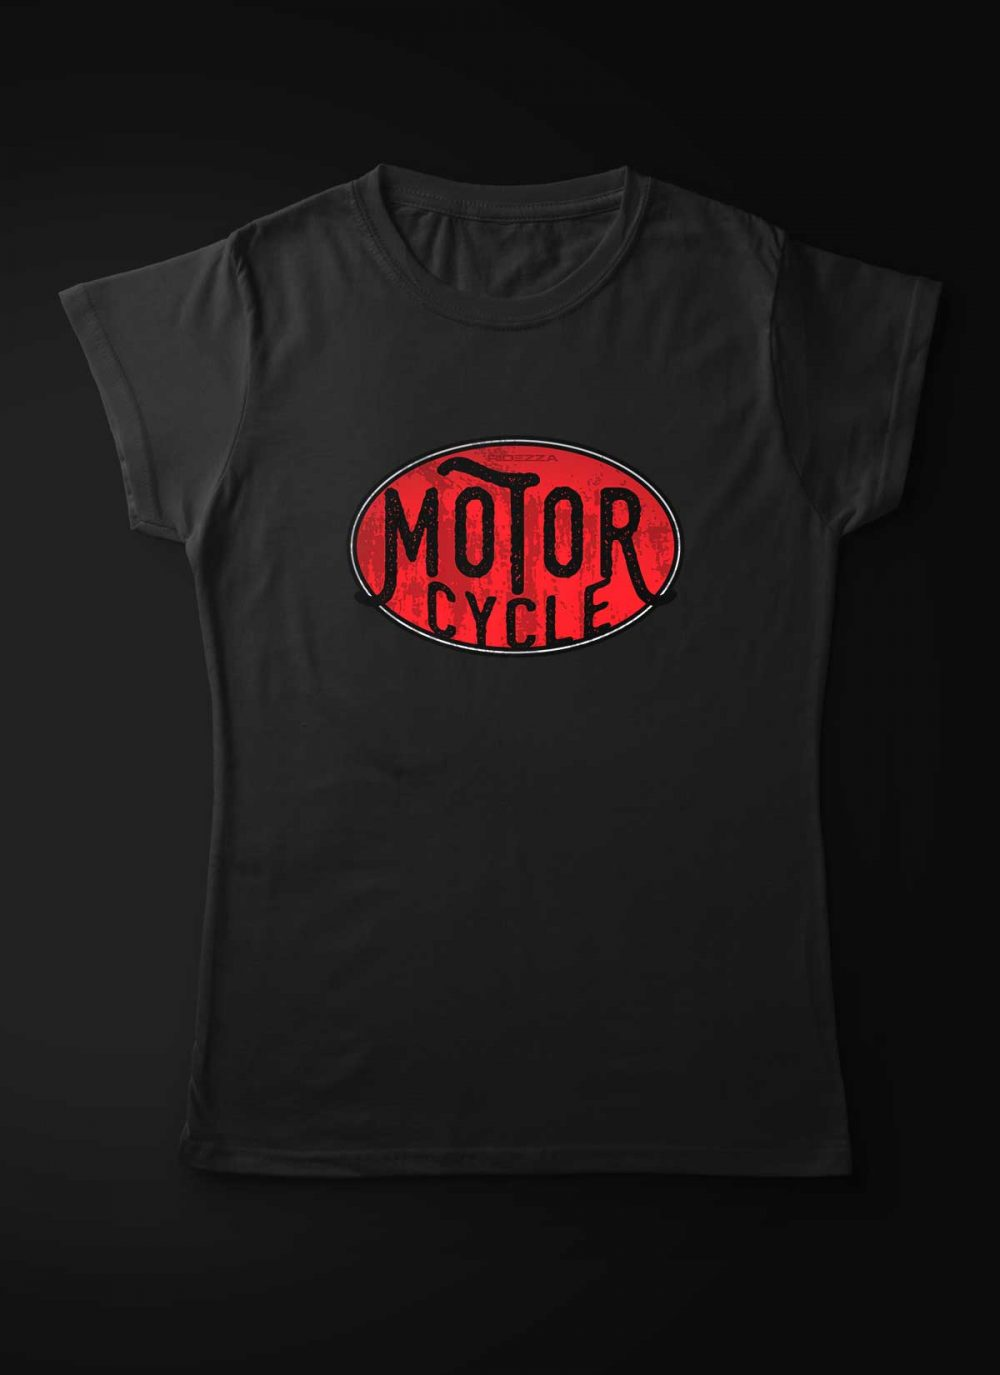 Motorcycle Club Women T-Shirt